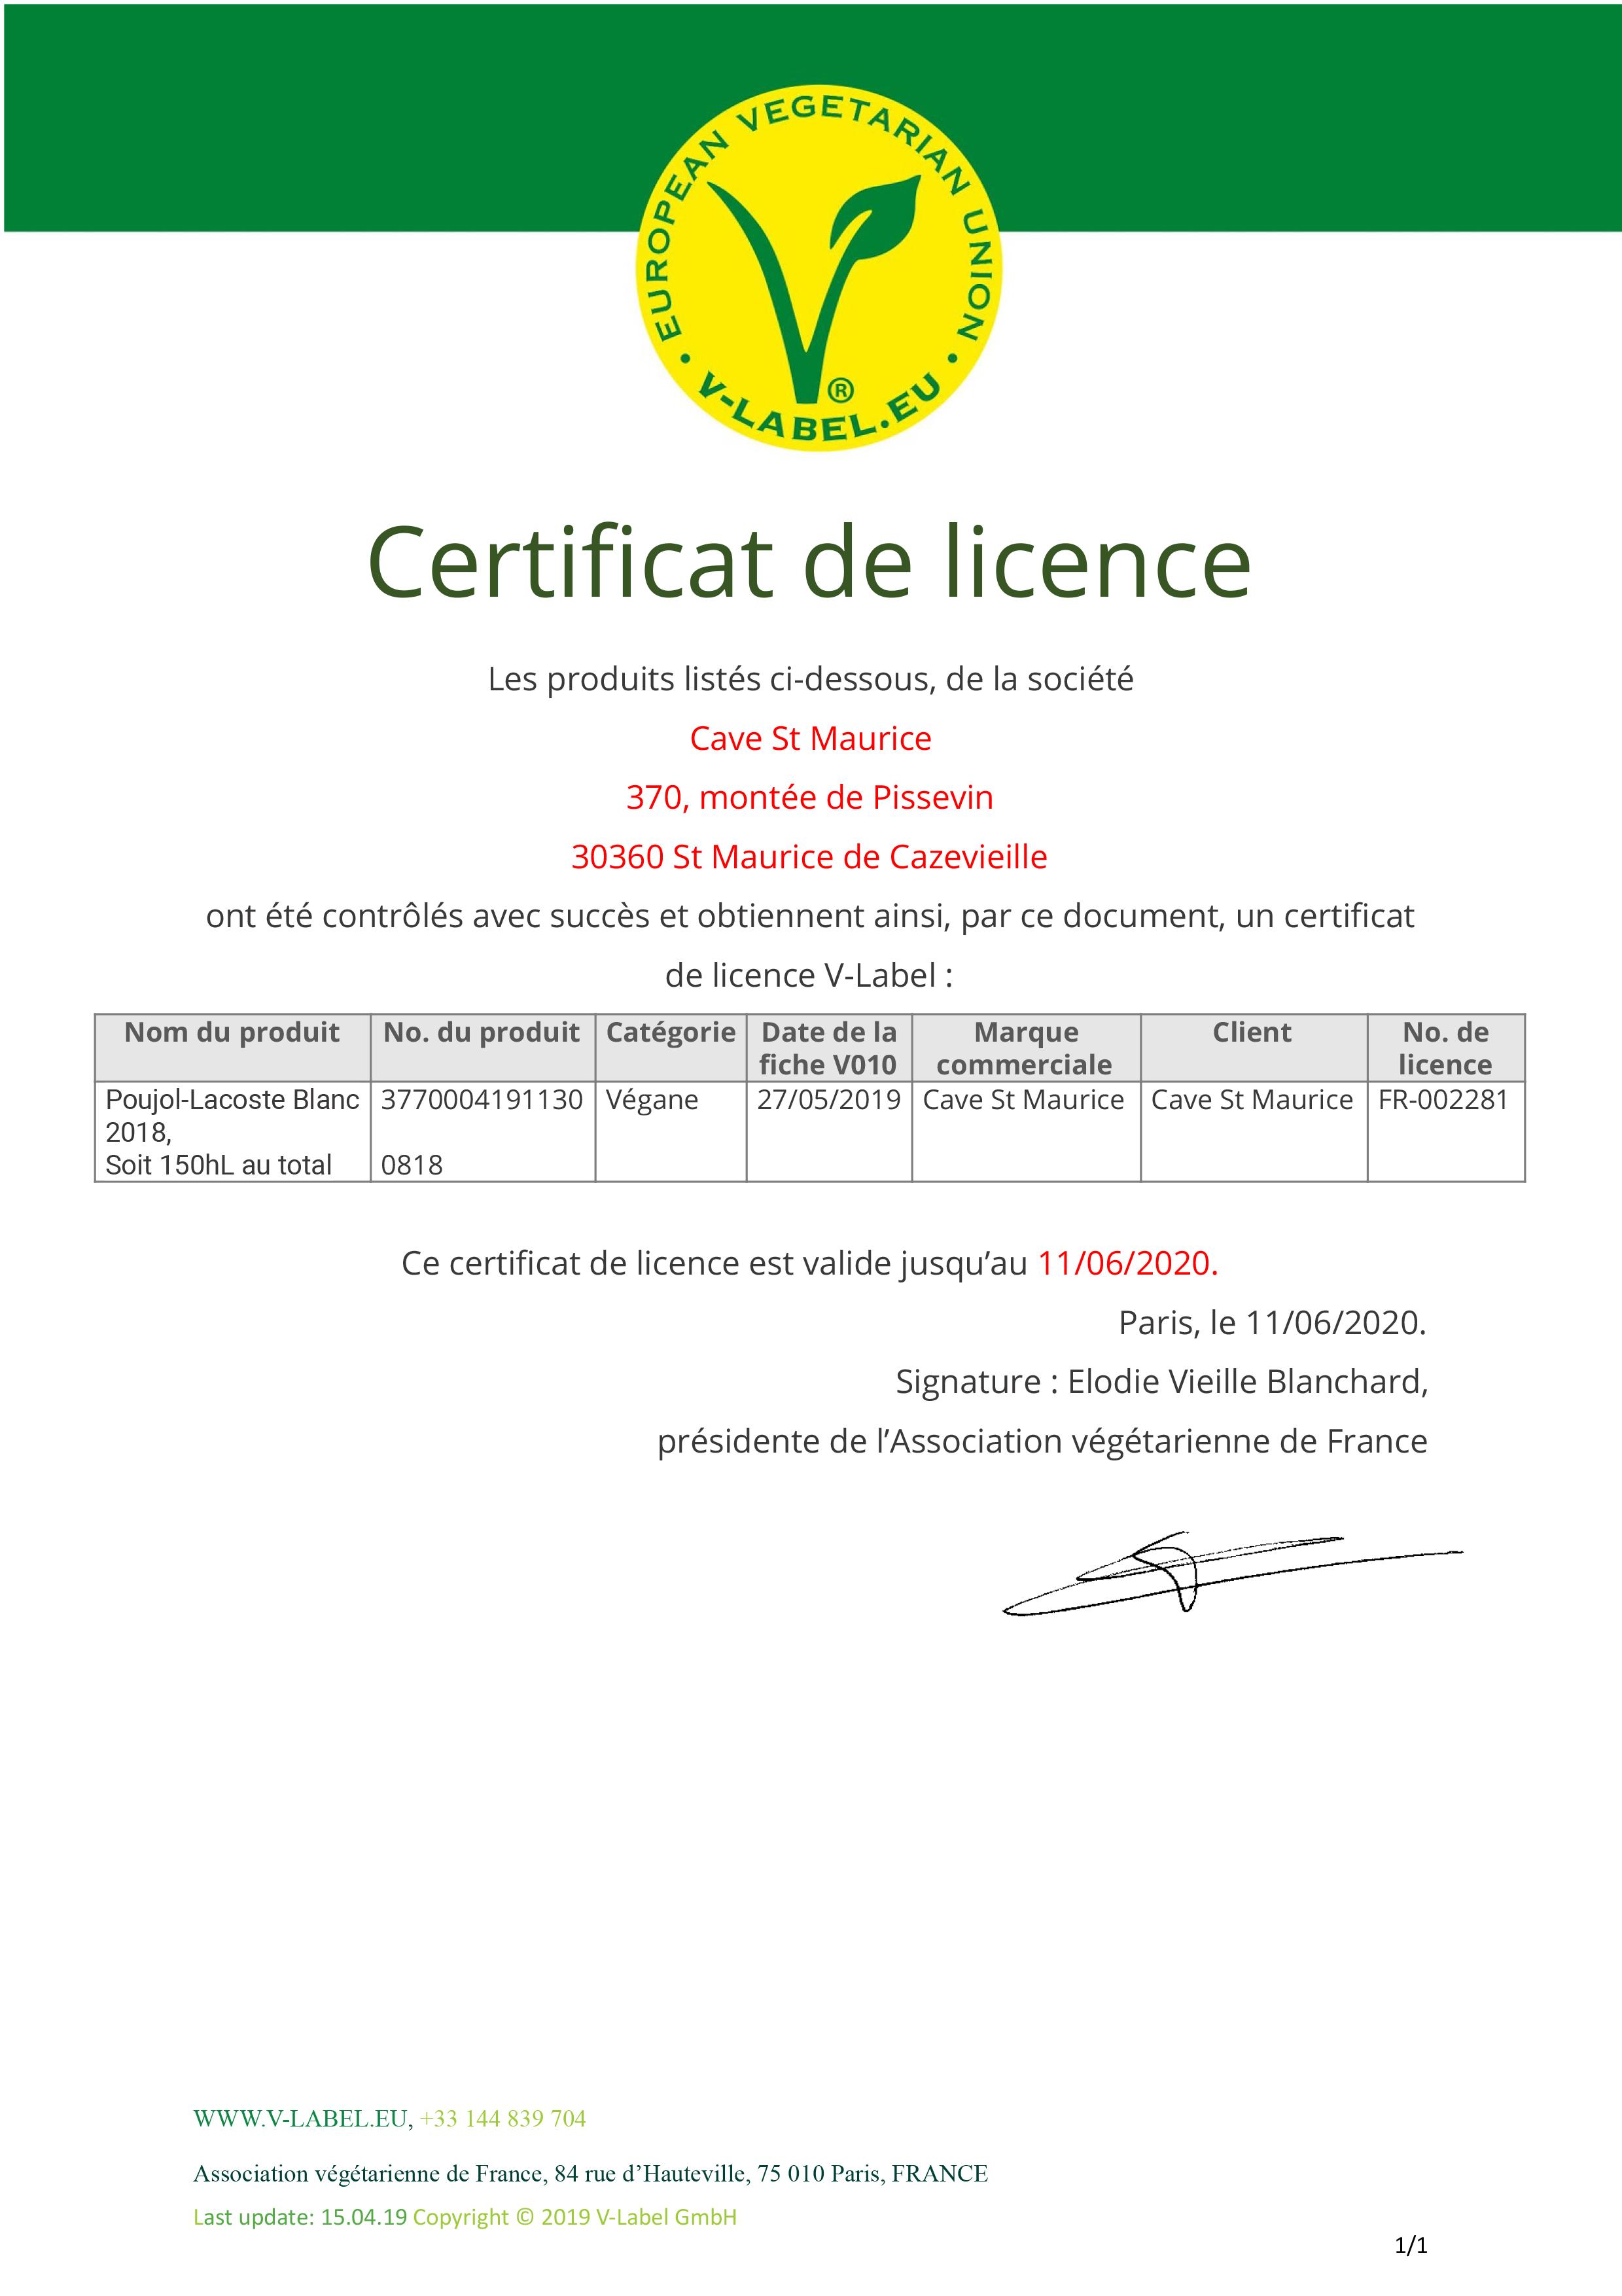 Cave St Maurice Certificat_FR-002281